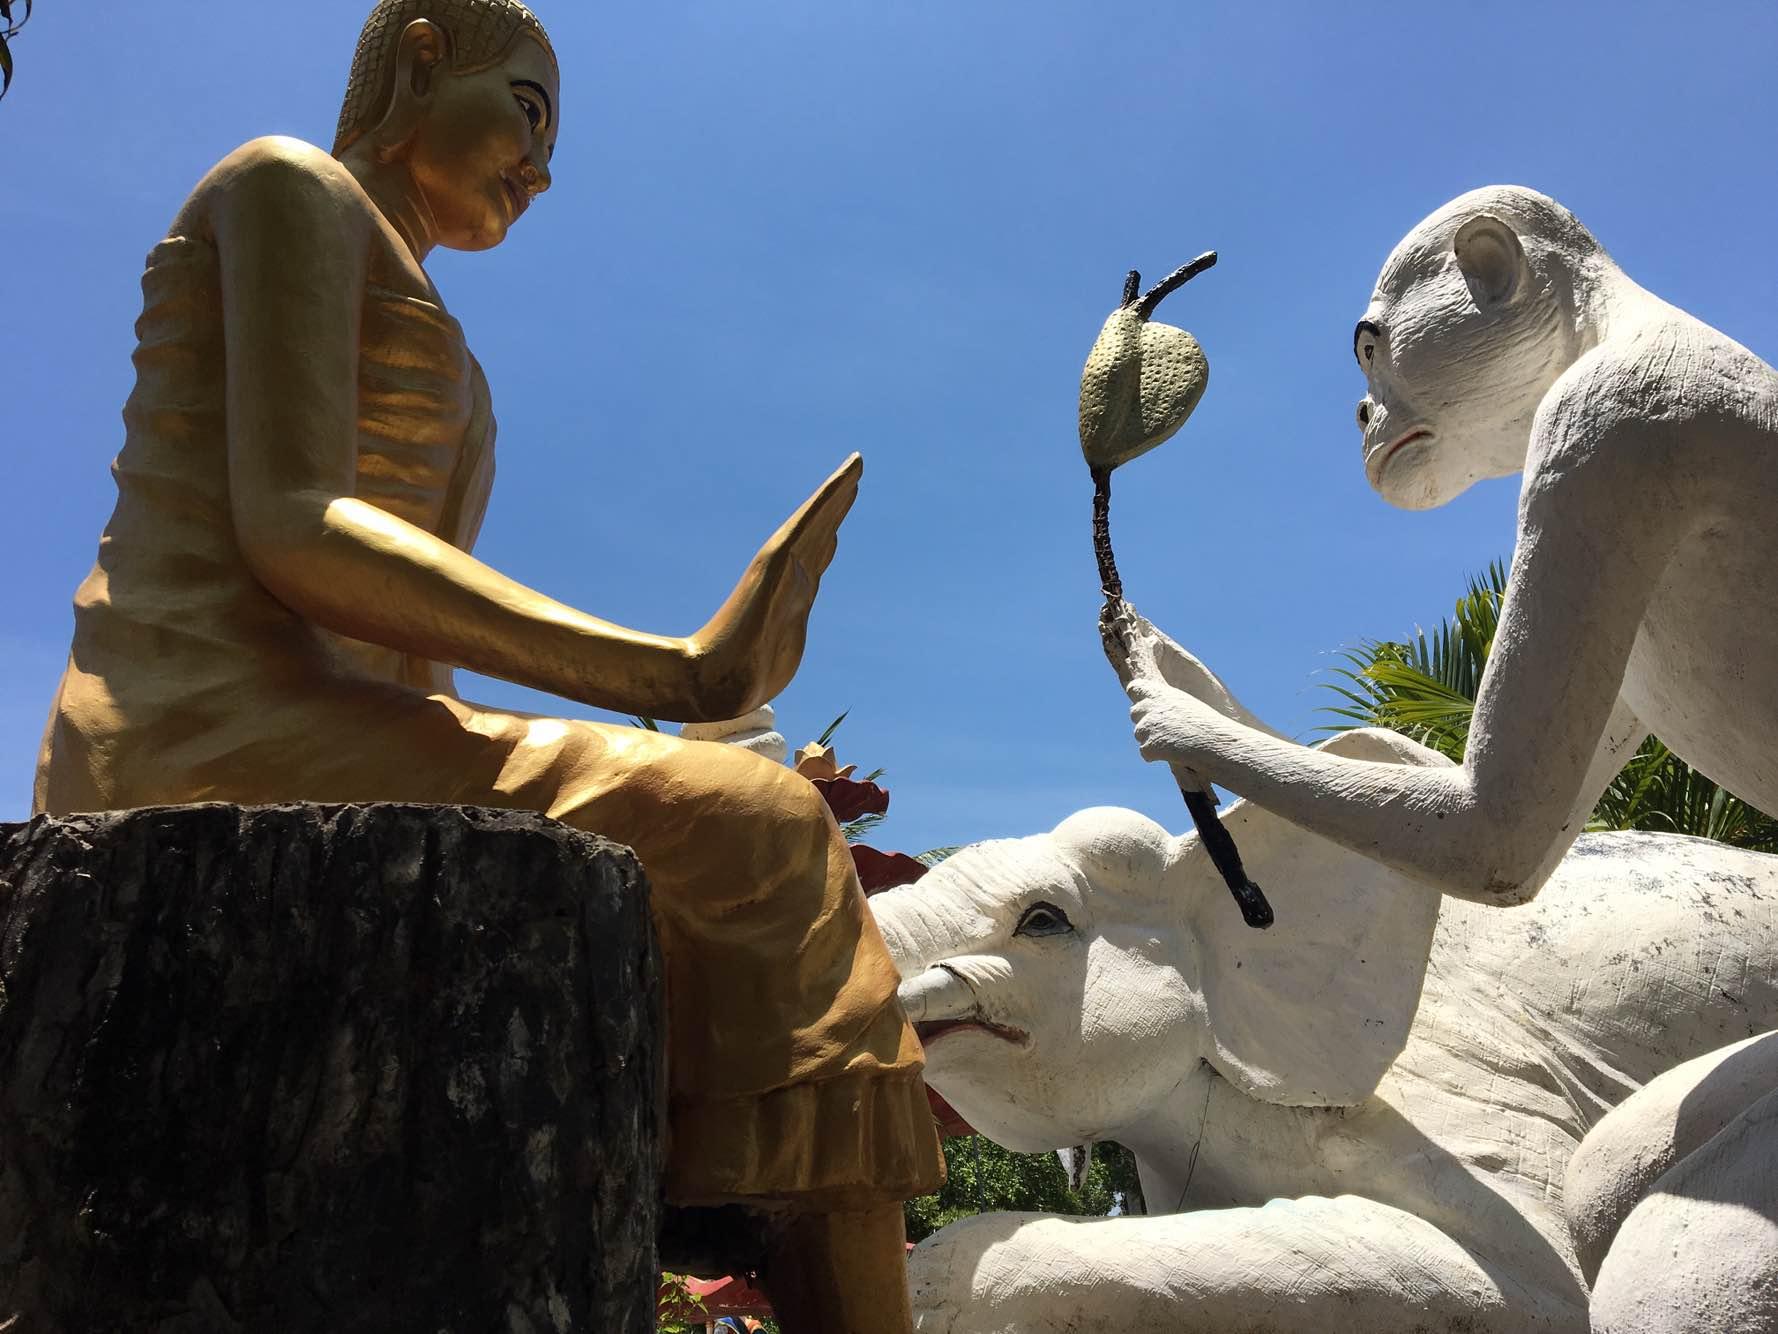 IMG 3328 - August 2017: Korean Kiddos and Khmer Kindness